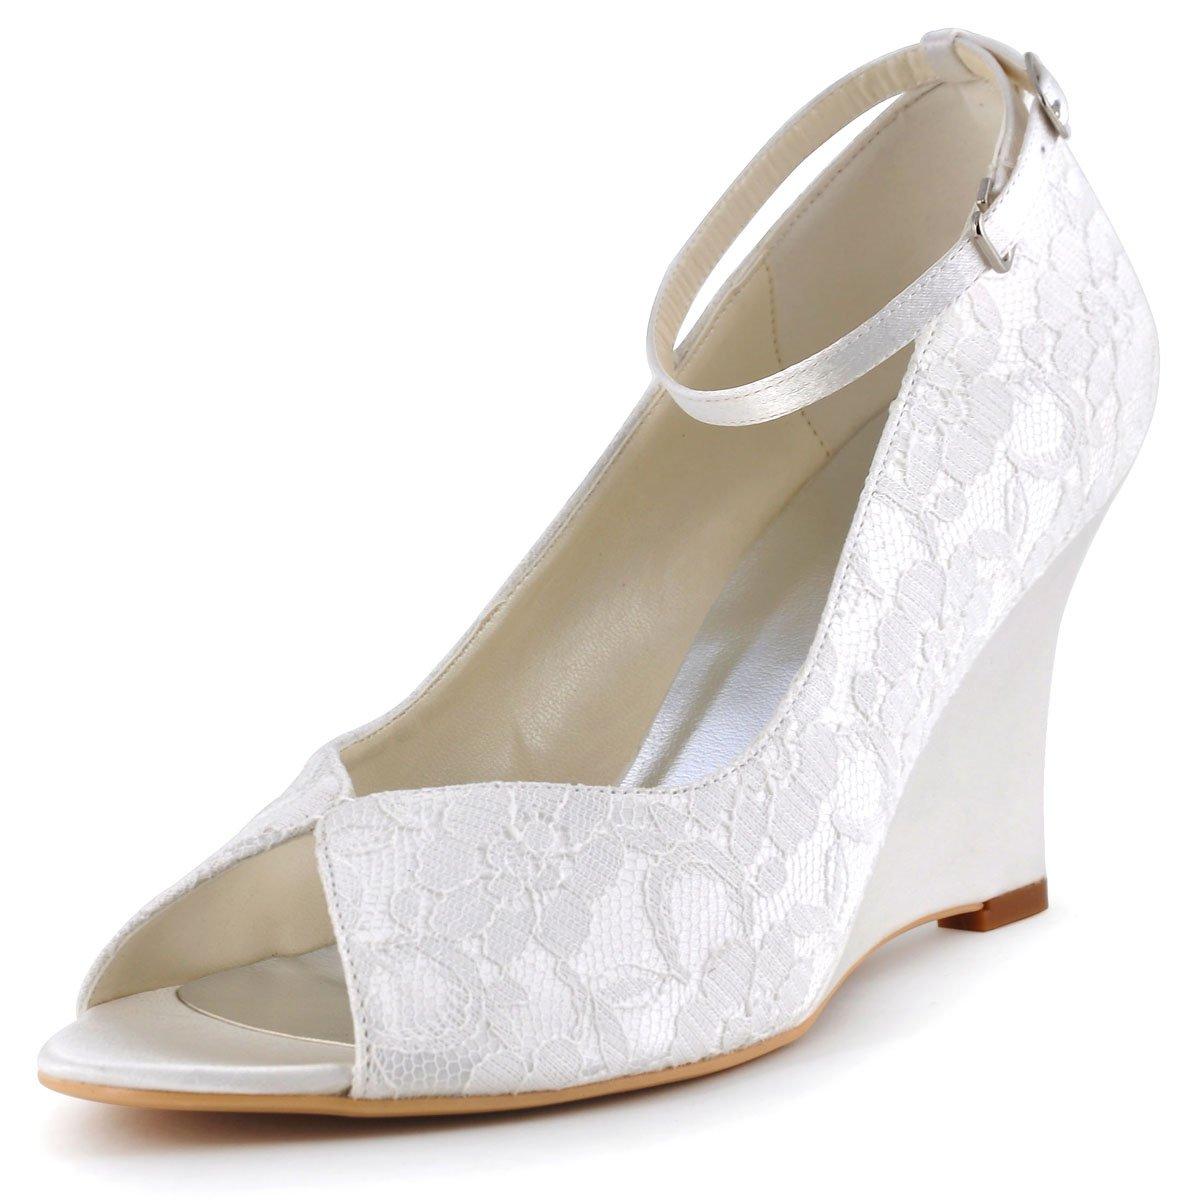 ElegantPark WP1415 Women Peep Toe Pumps High Heel Wedges Ankle Strap Lace Wedding Bridal Shoes B00QK7BGRS 10 B(M) US|Ivory